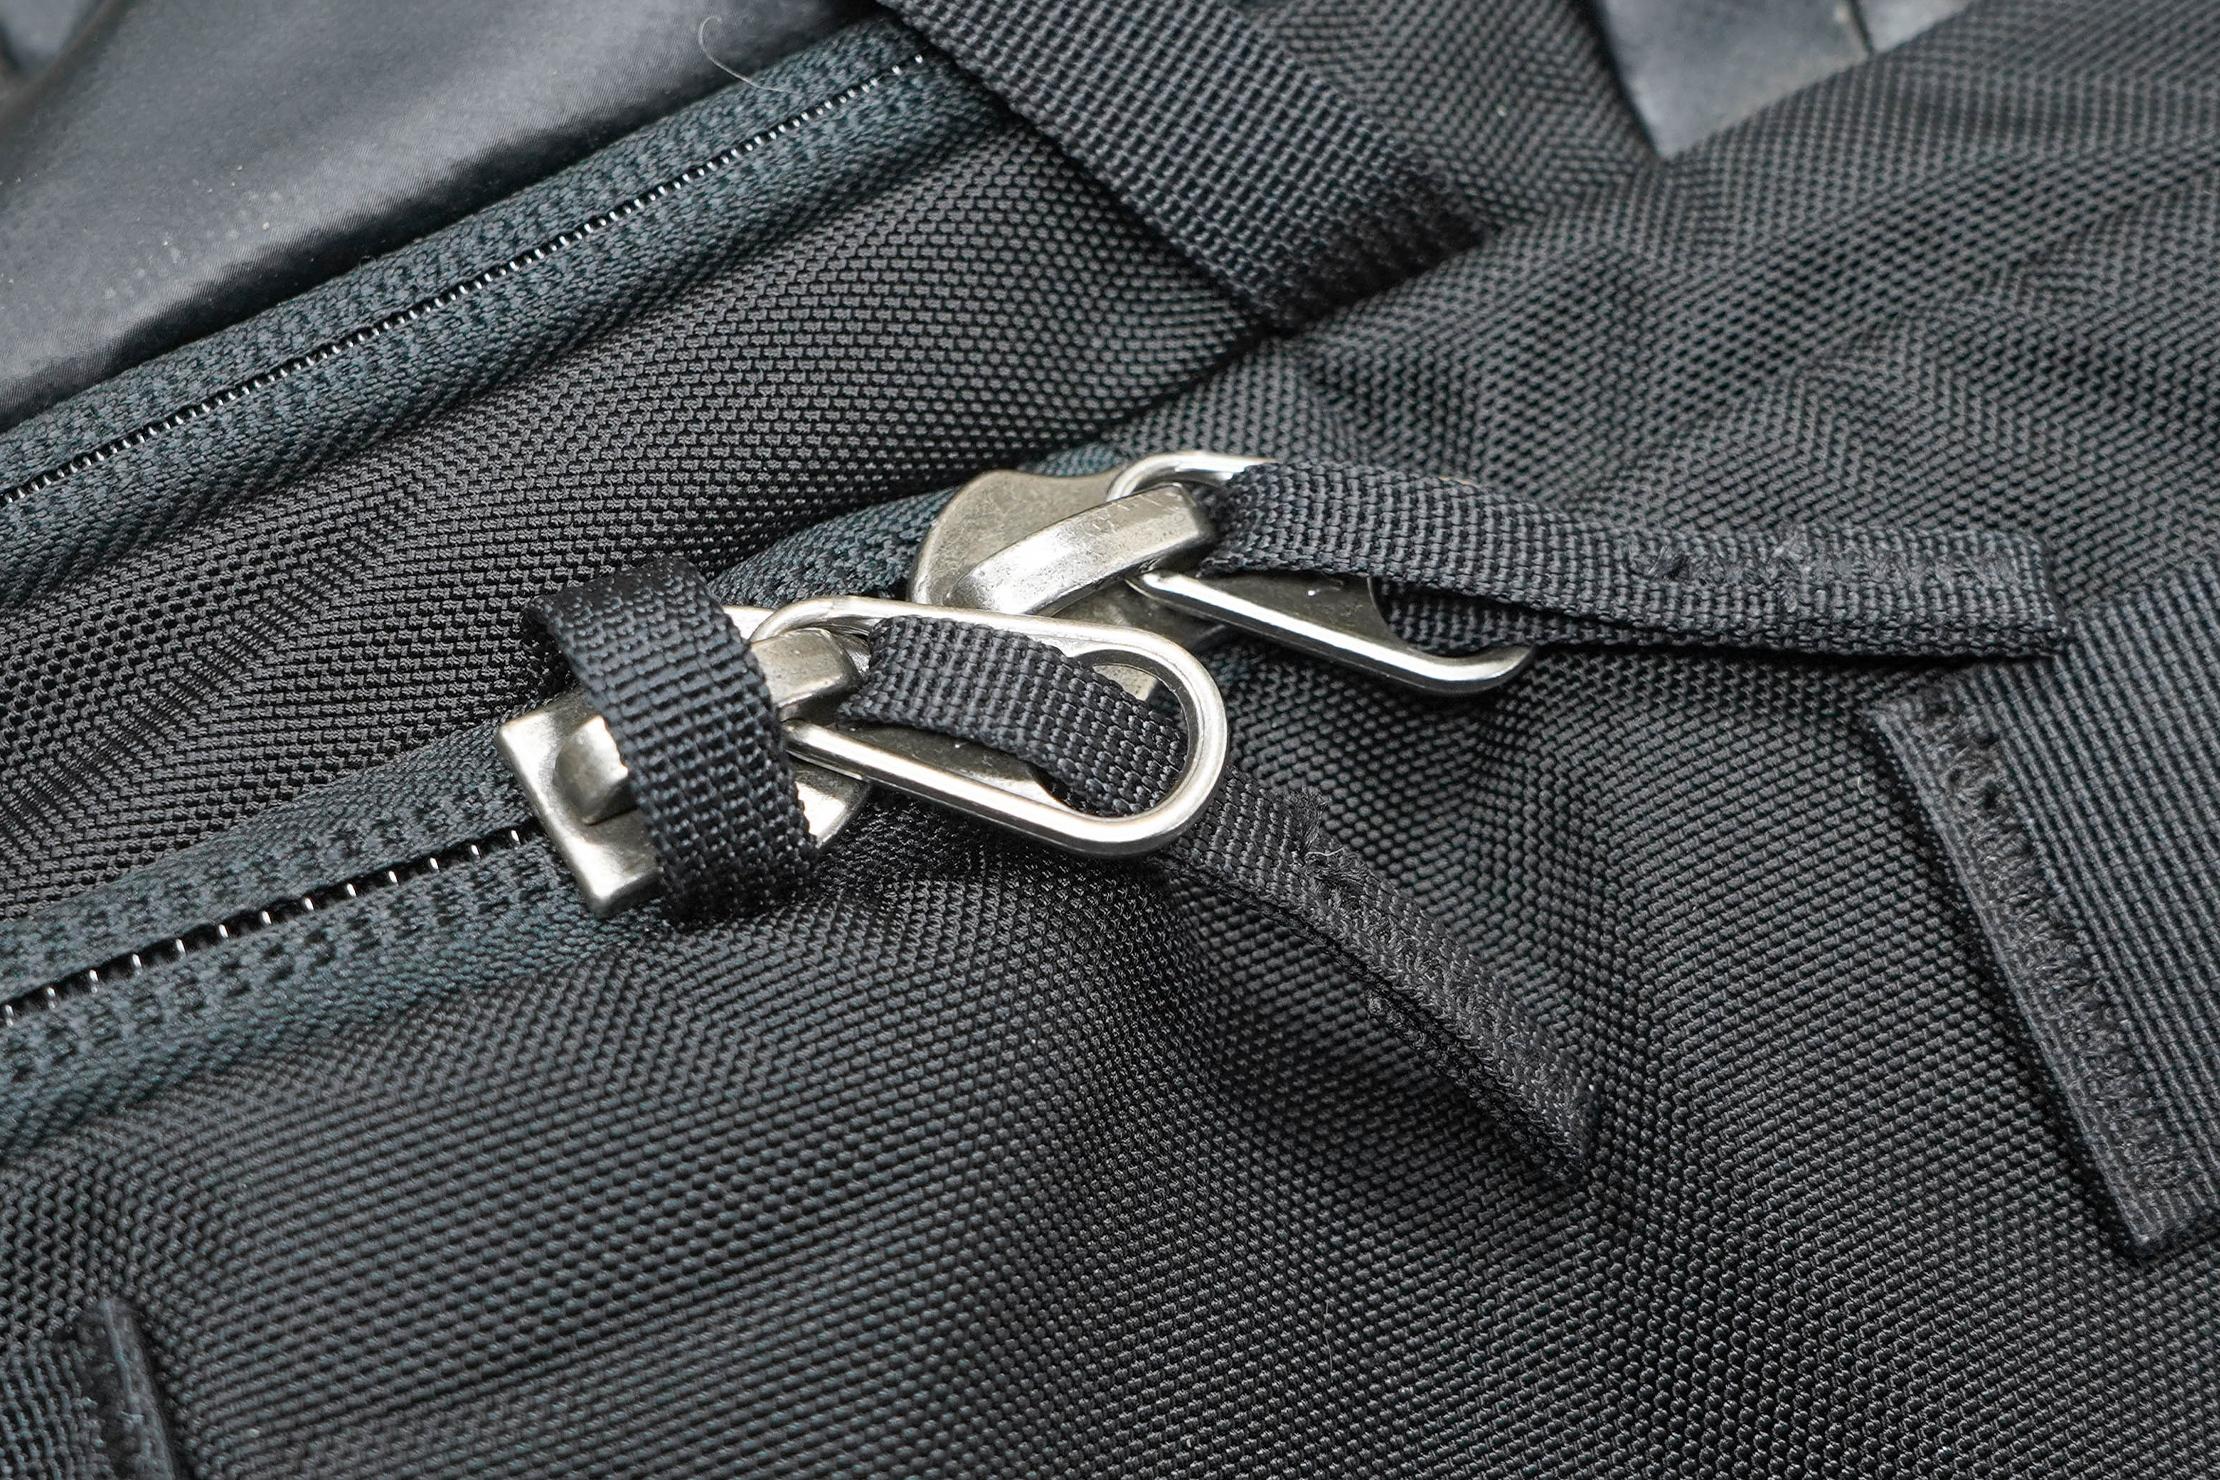 Cotopaxi Allpa 42L Locking Zippers